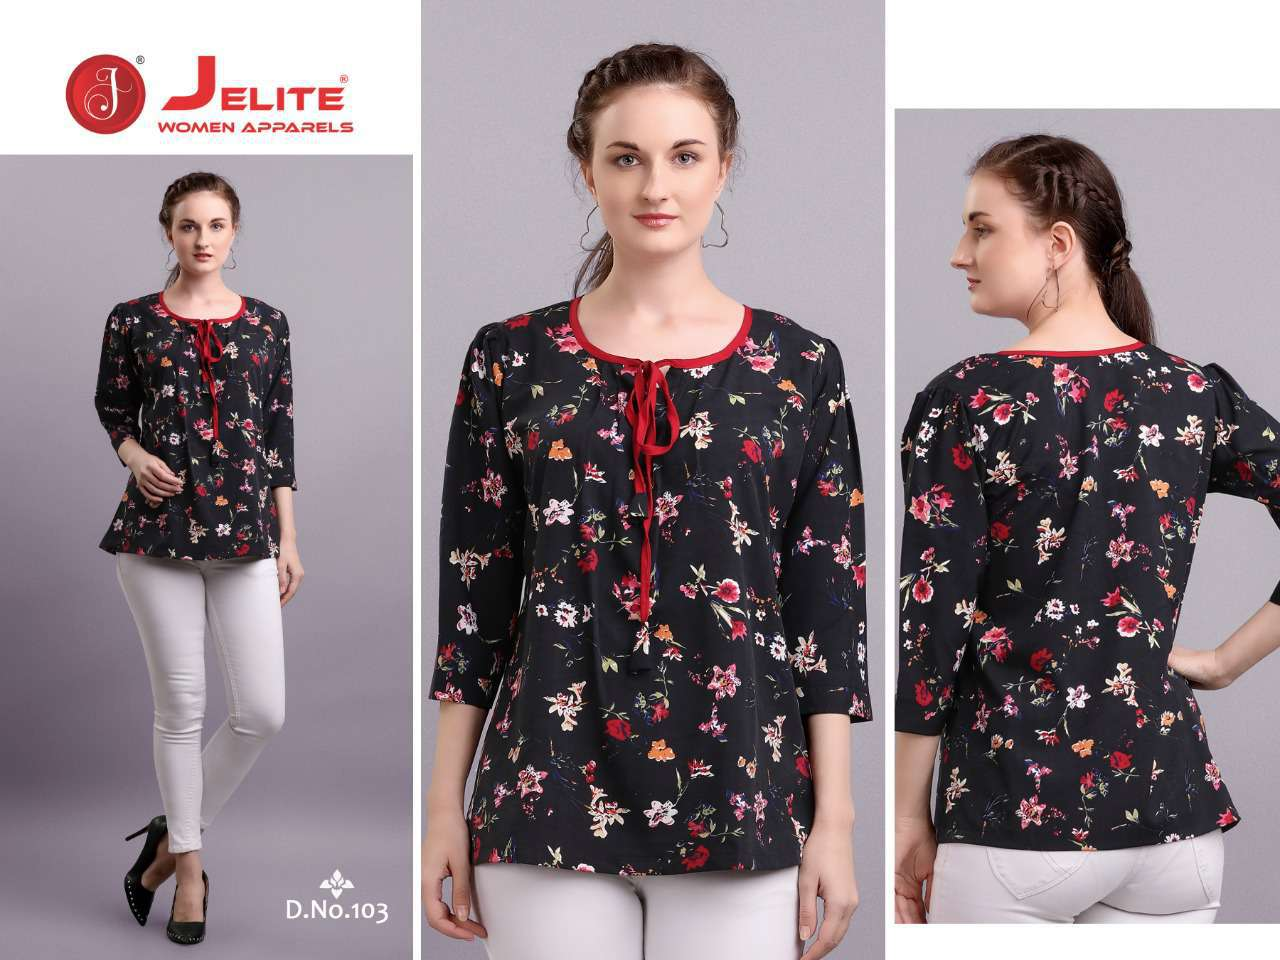 Jelite Tulip Tops Wholesale Catalog 8 Pcs 3 - Jelite Tulip Tops Wholesale Catalog 8 Pcs